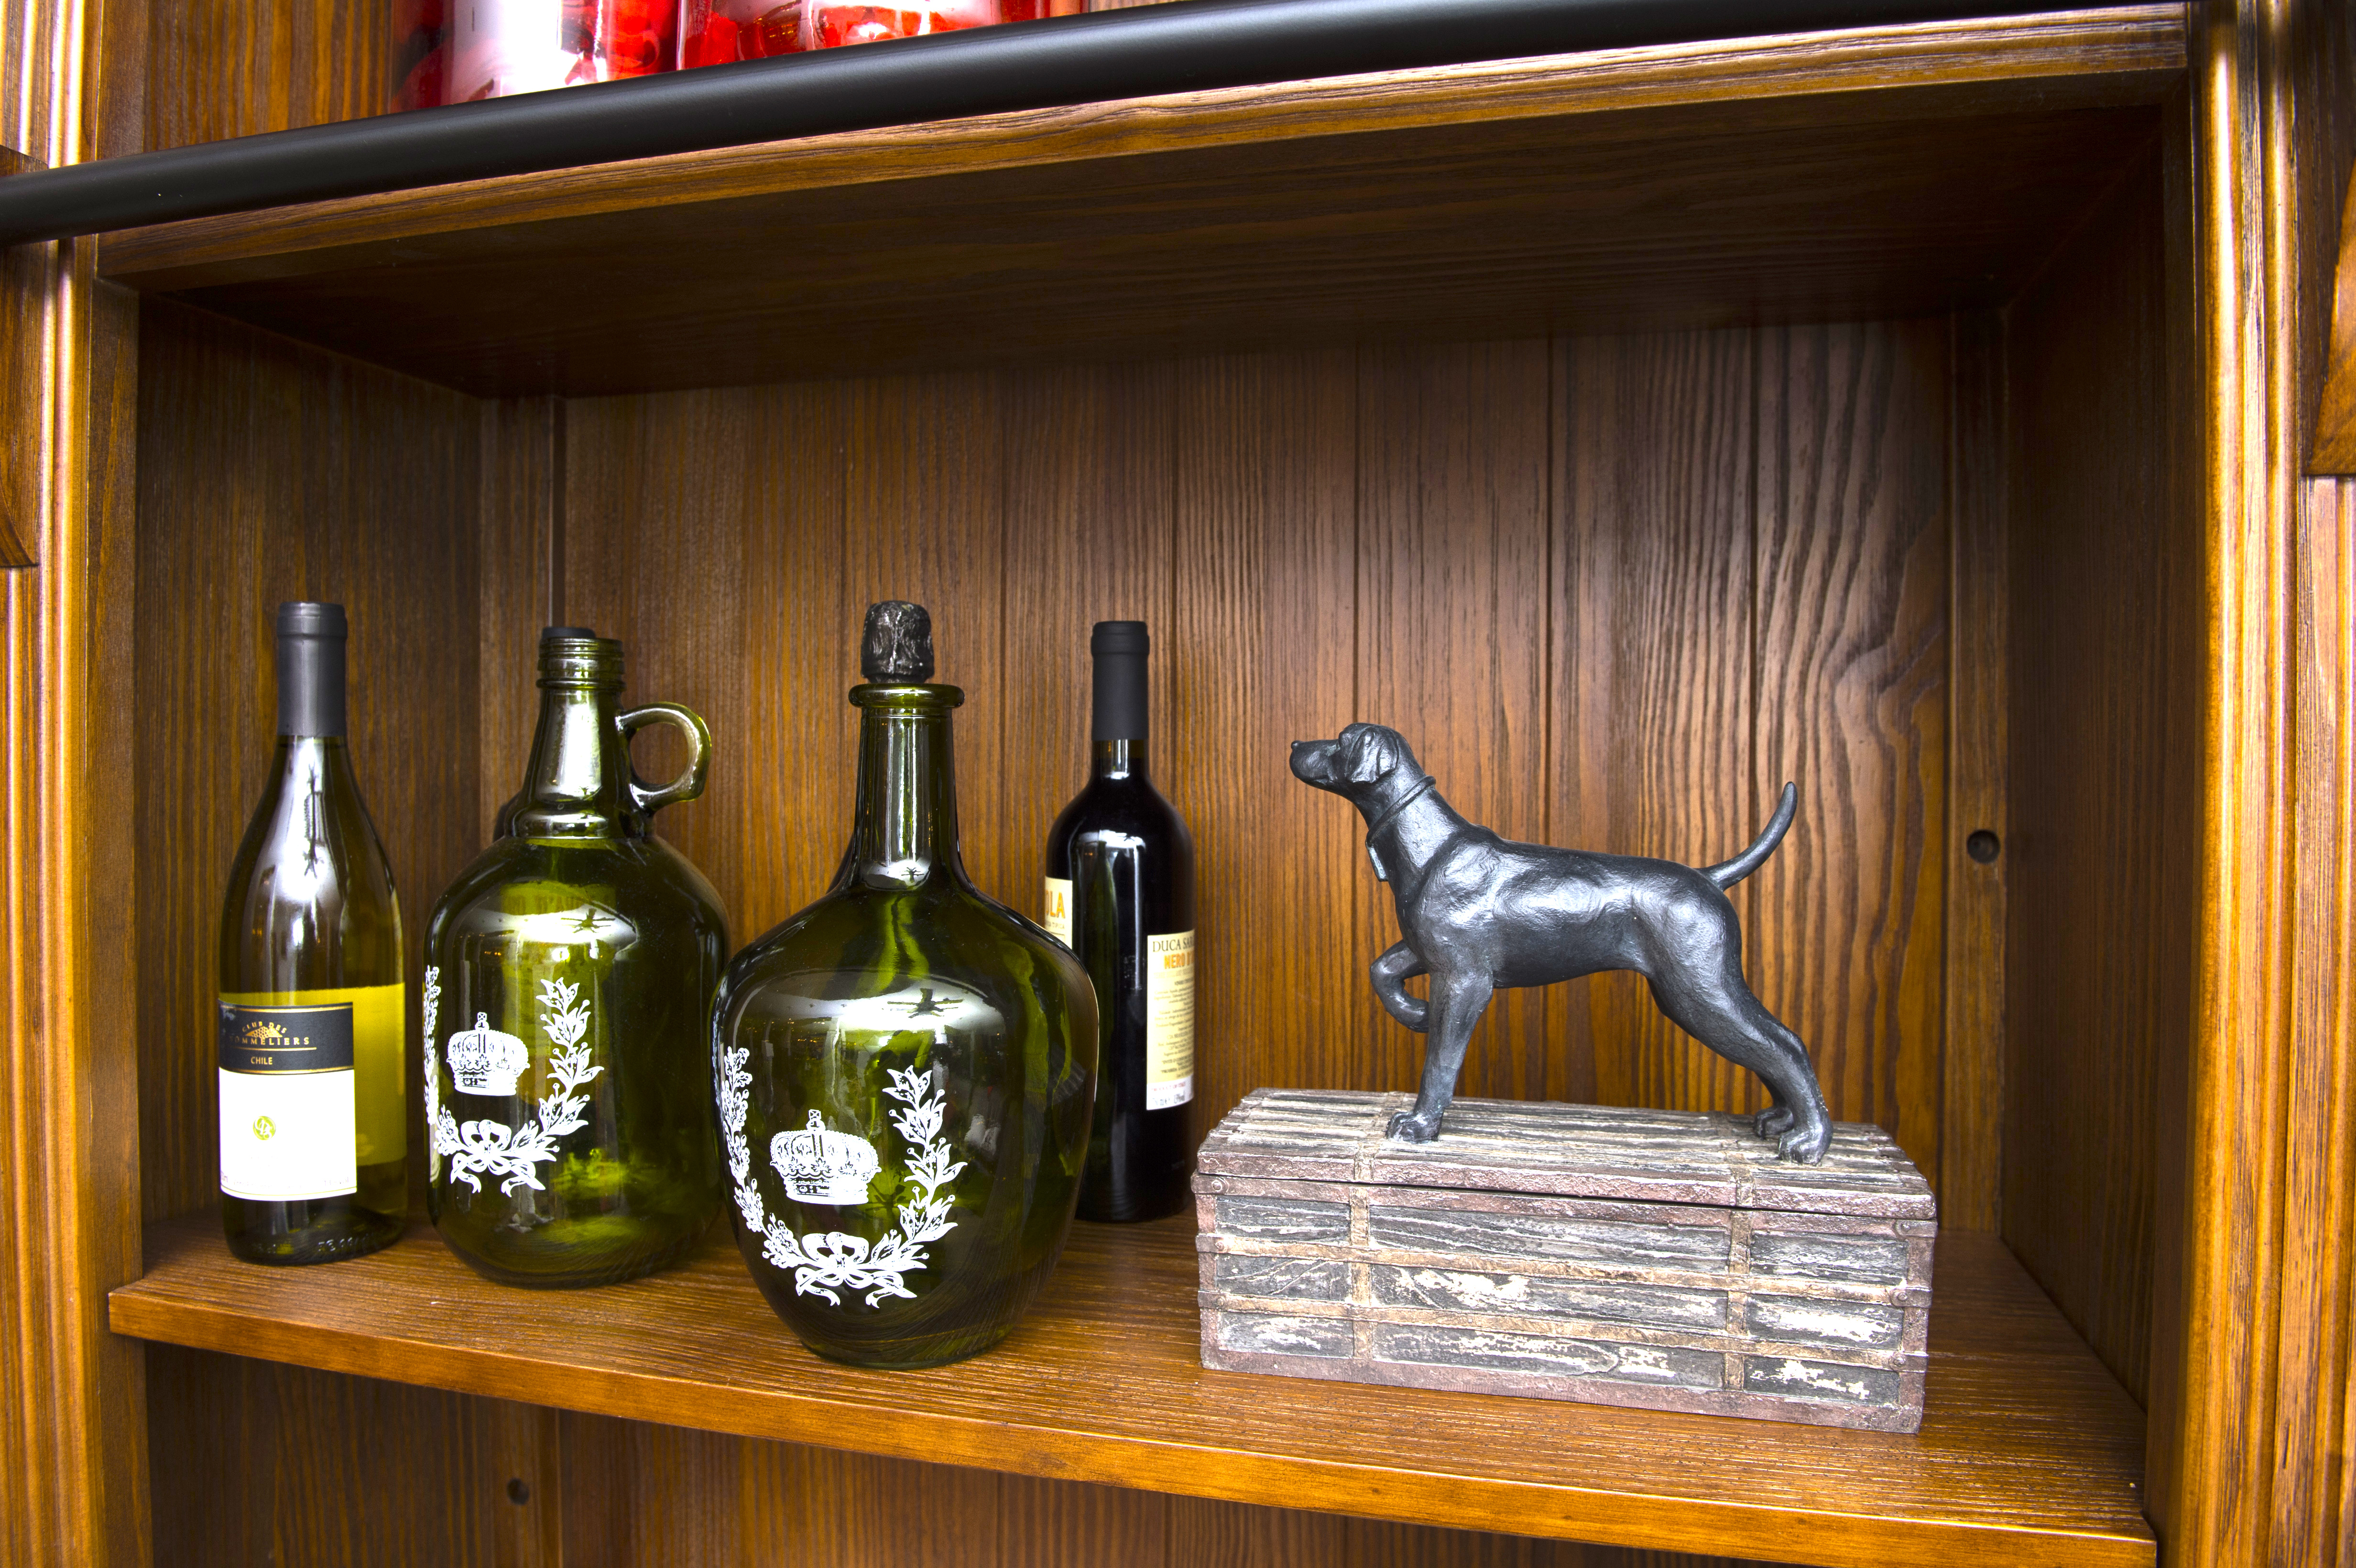 Historia das growlers: garrafas vintage para cerveja artesanal